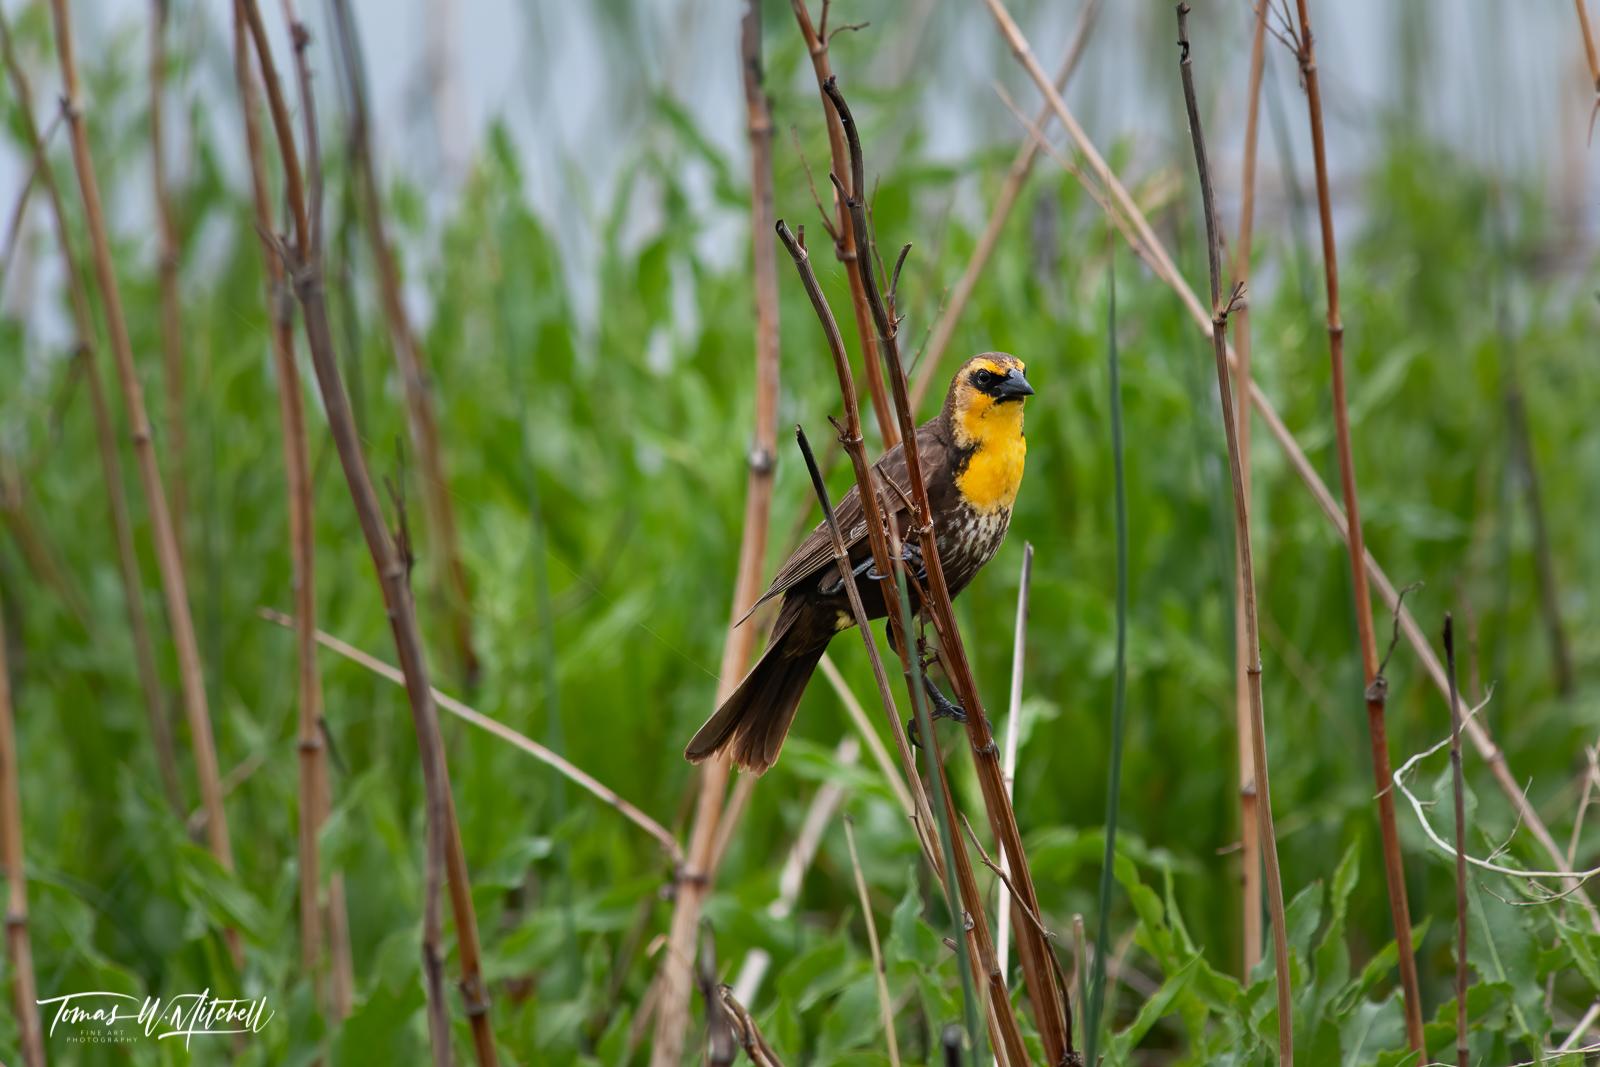 limited edition, fine art prints, xanthocephalus, yellow-headed black bird, female, yellow, photograph, bear river bird refuge, utah, photo